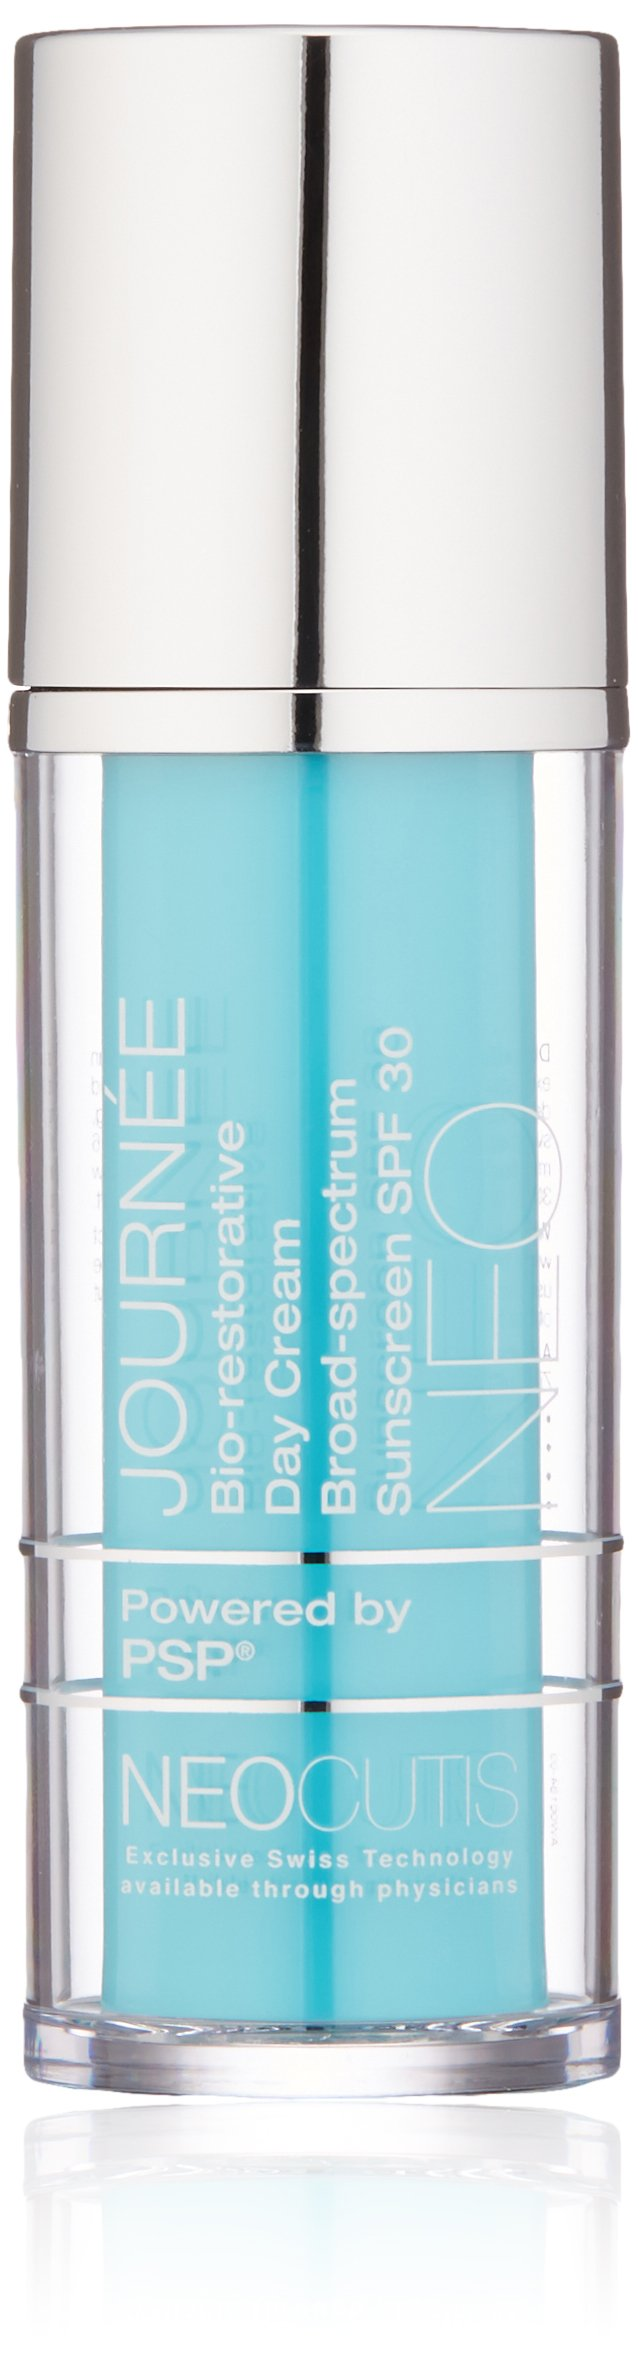 NEOCUTIS Journée Bio-restorative Day Cream Broad-spectrum SPF 30 Sunscreen, 1 Fl Oz